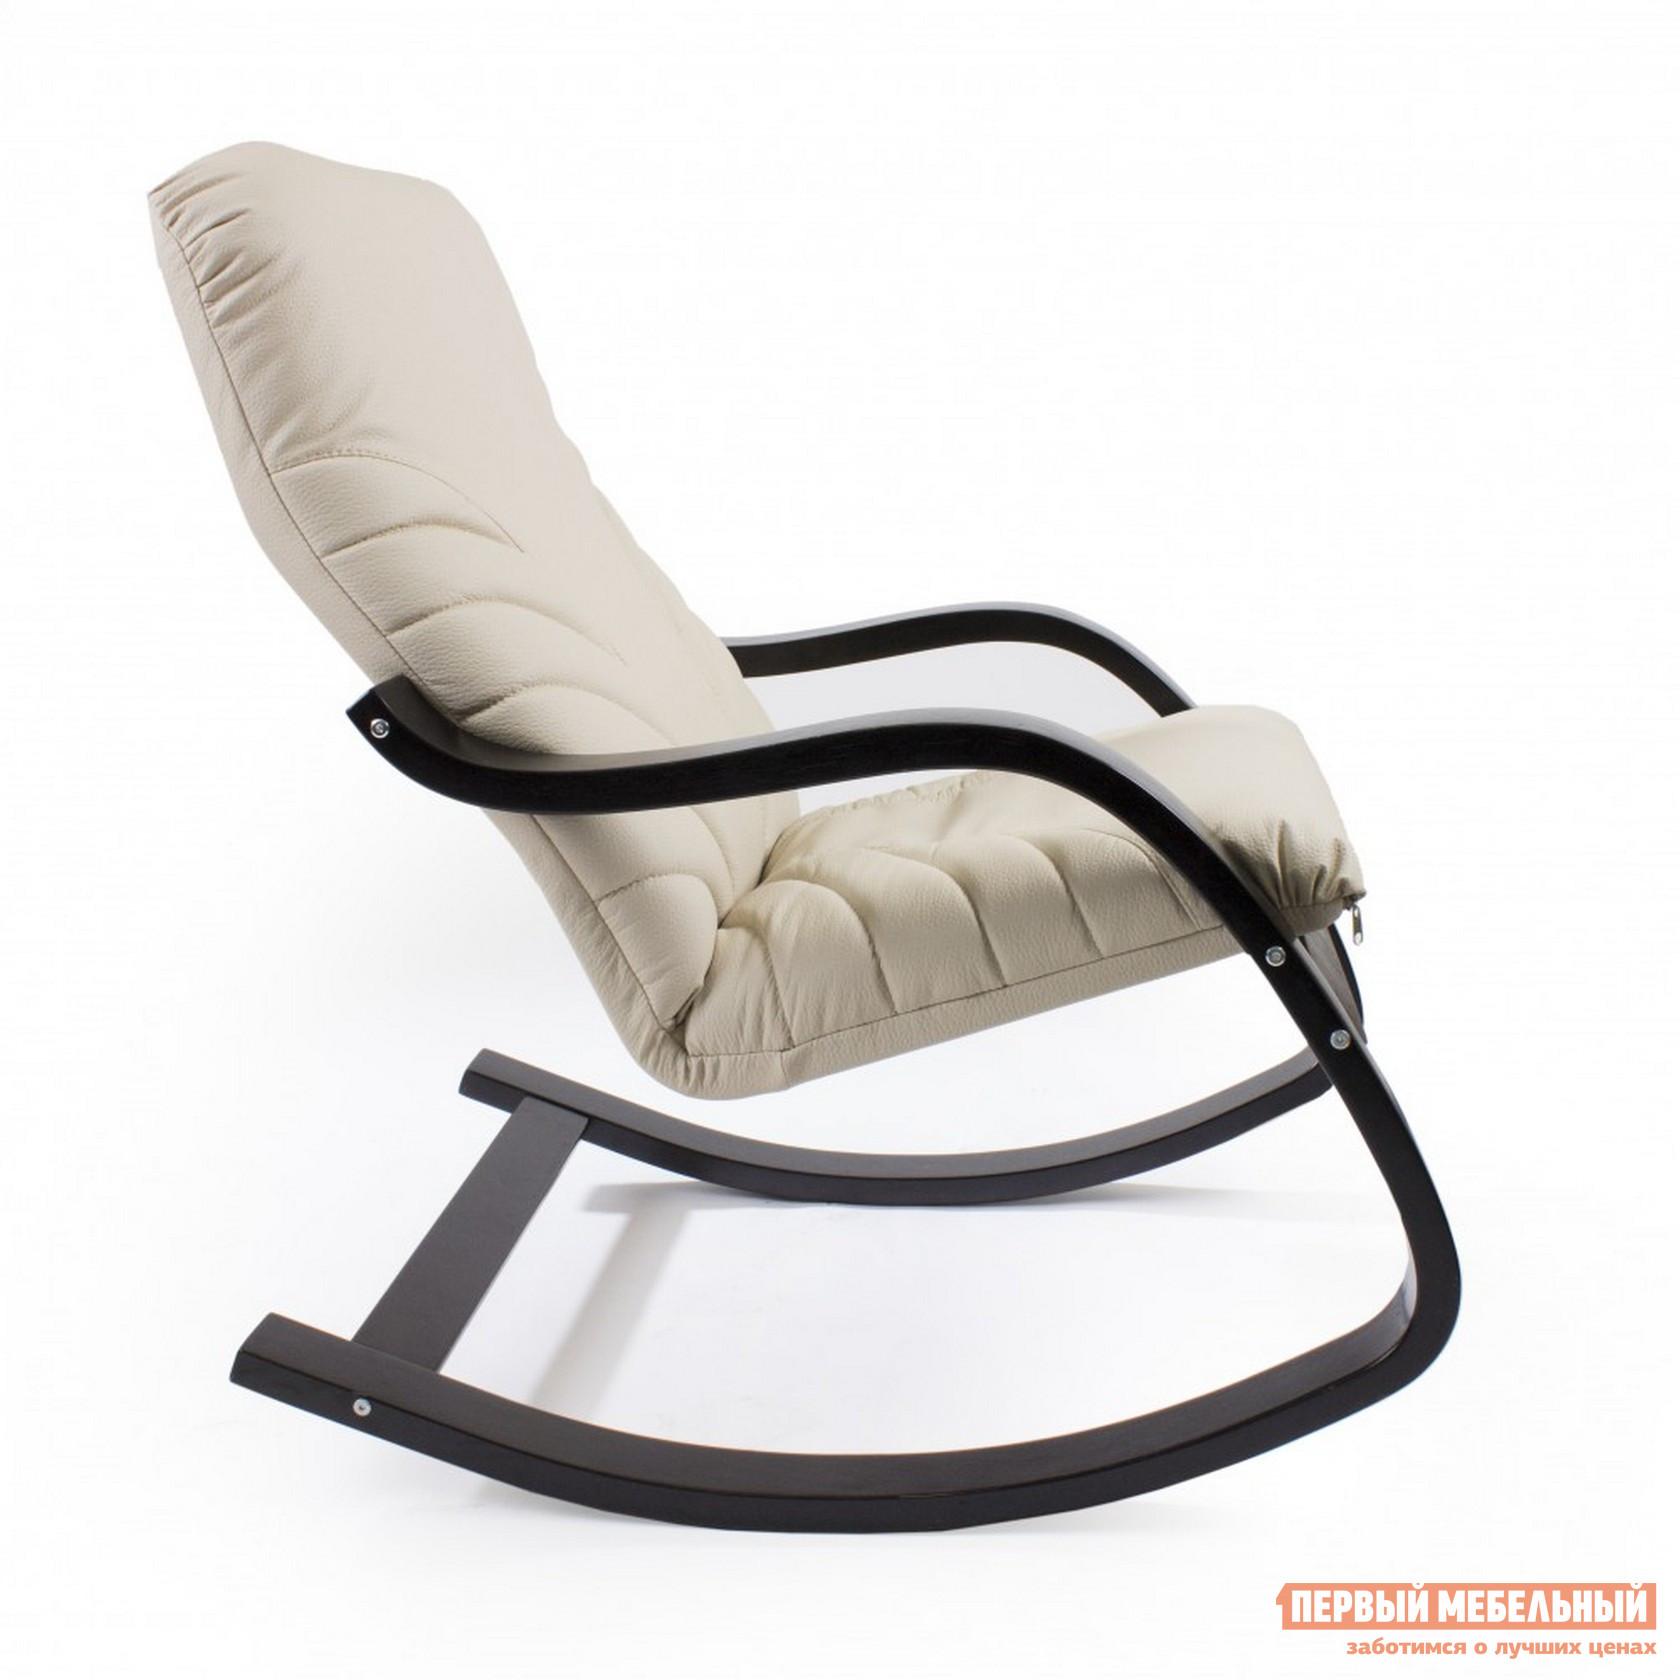 Кресло-качалка Грин Три Кресло качалка ЭЙР цена